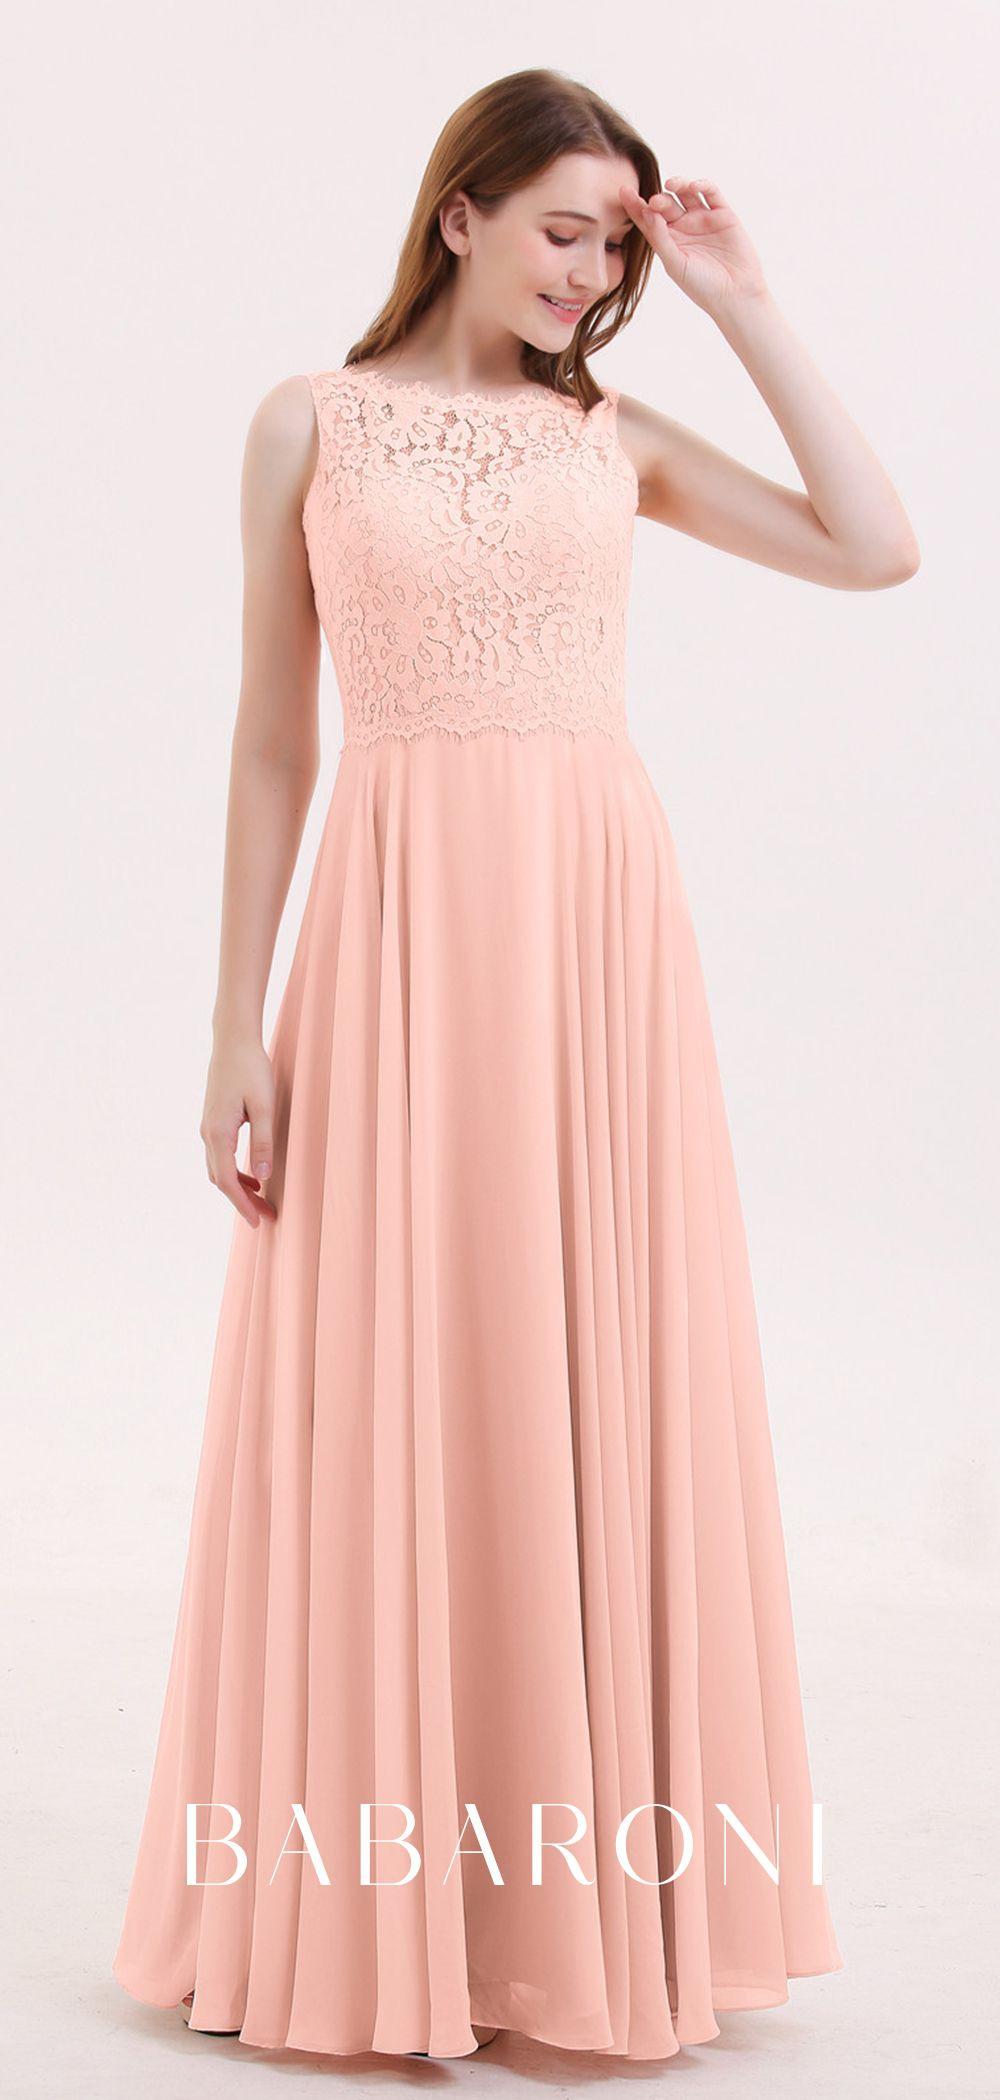 Designer Spektakulär Kleid Koralle Lang SpezialgebietDesigner Cool Kleid Koralle Lang Galerie